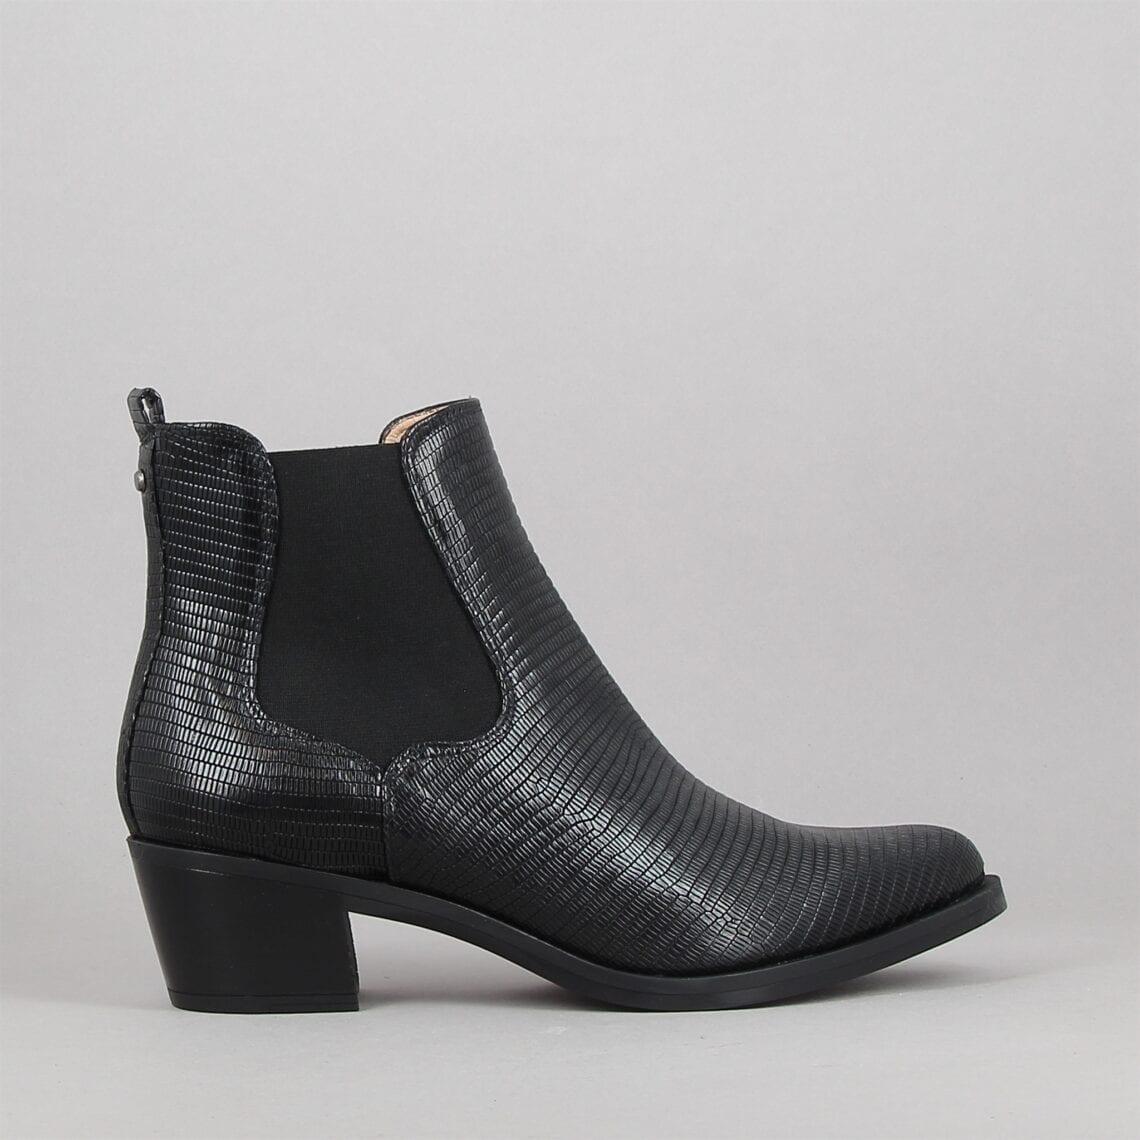 greyson-noir-182992898-0.jpg